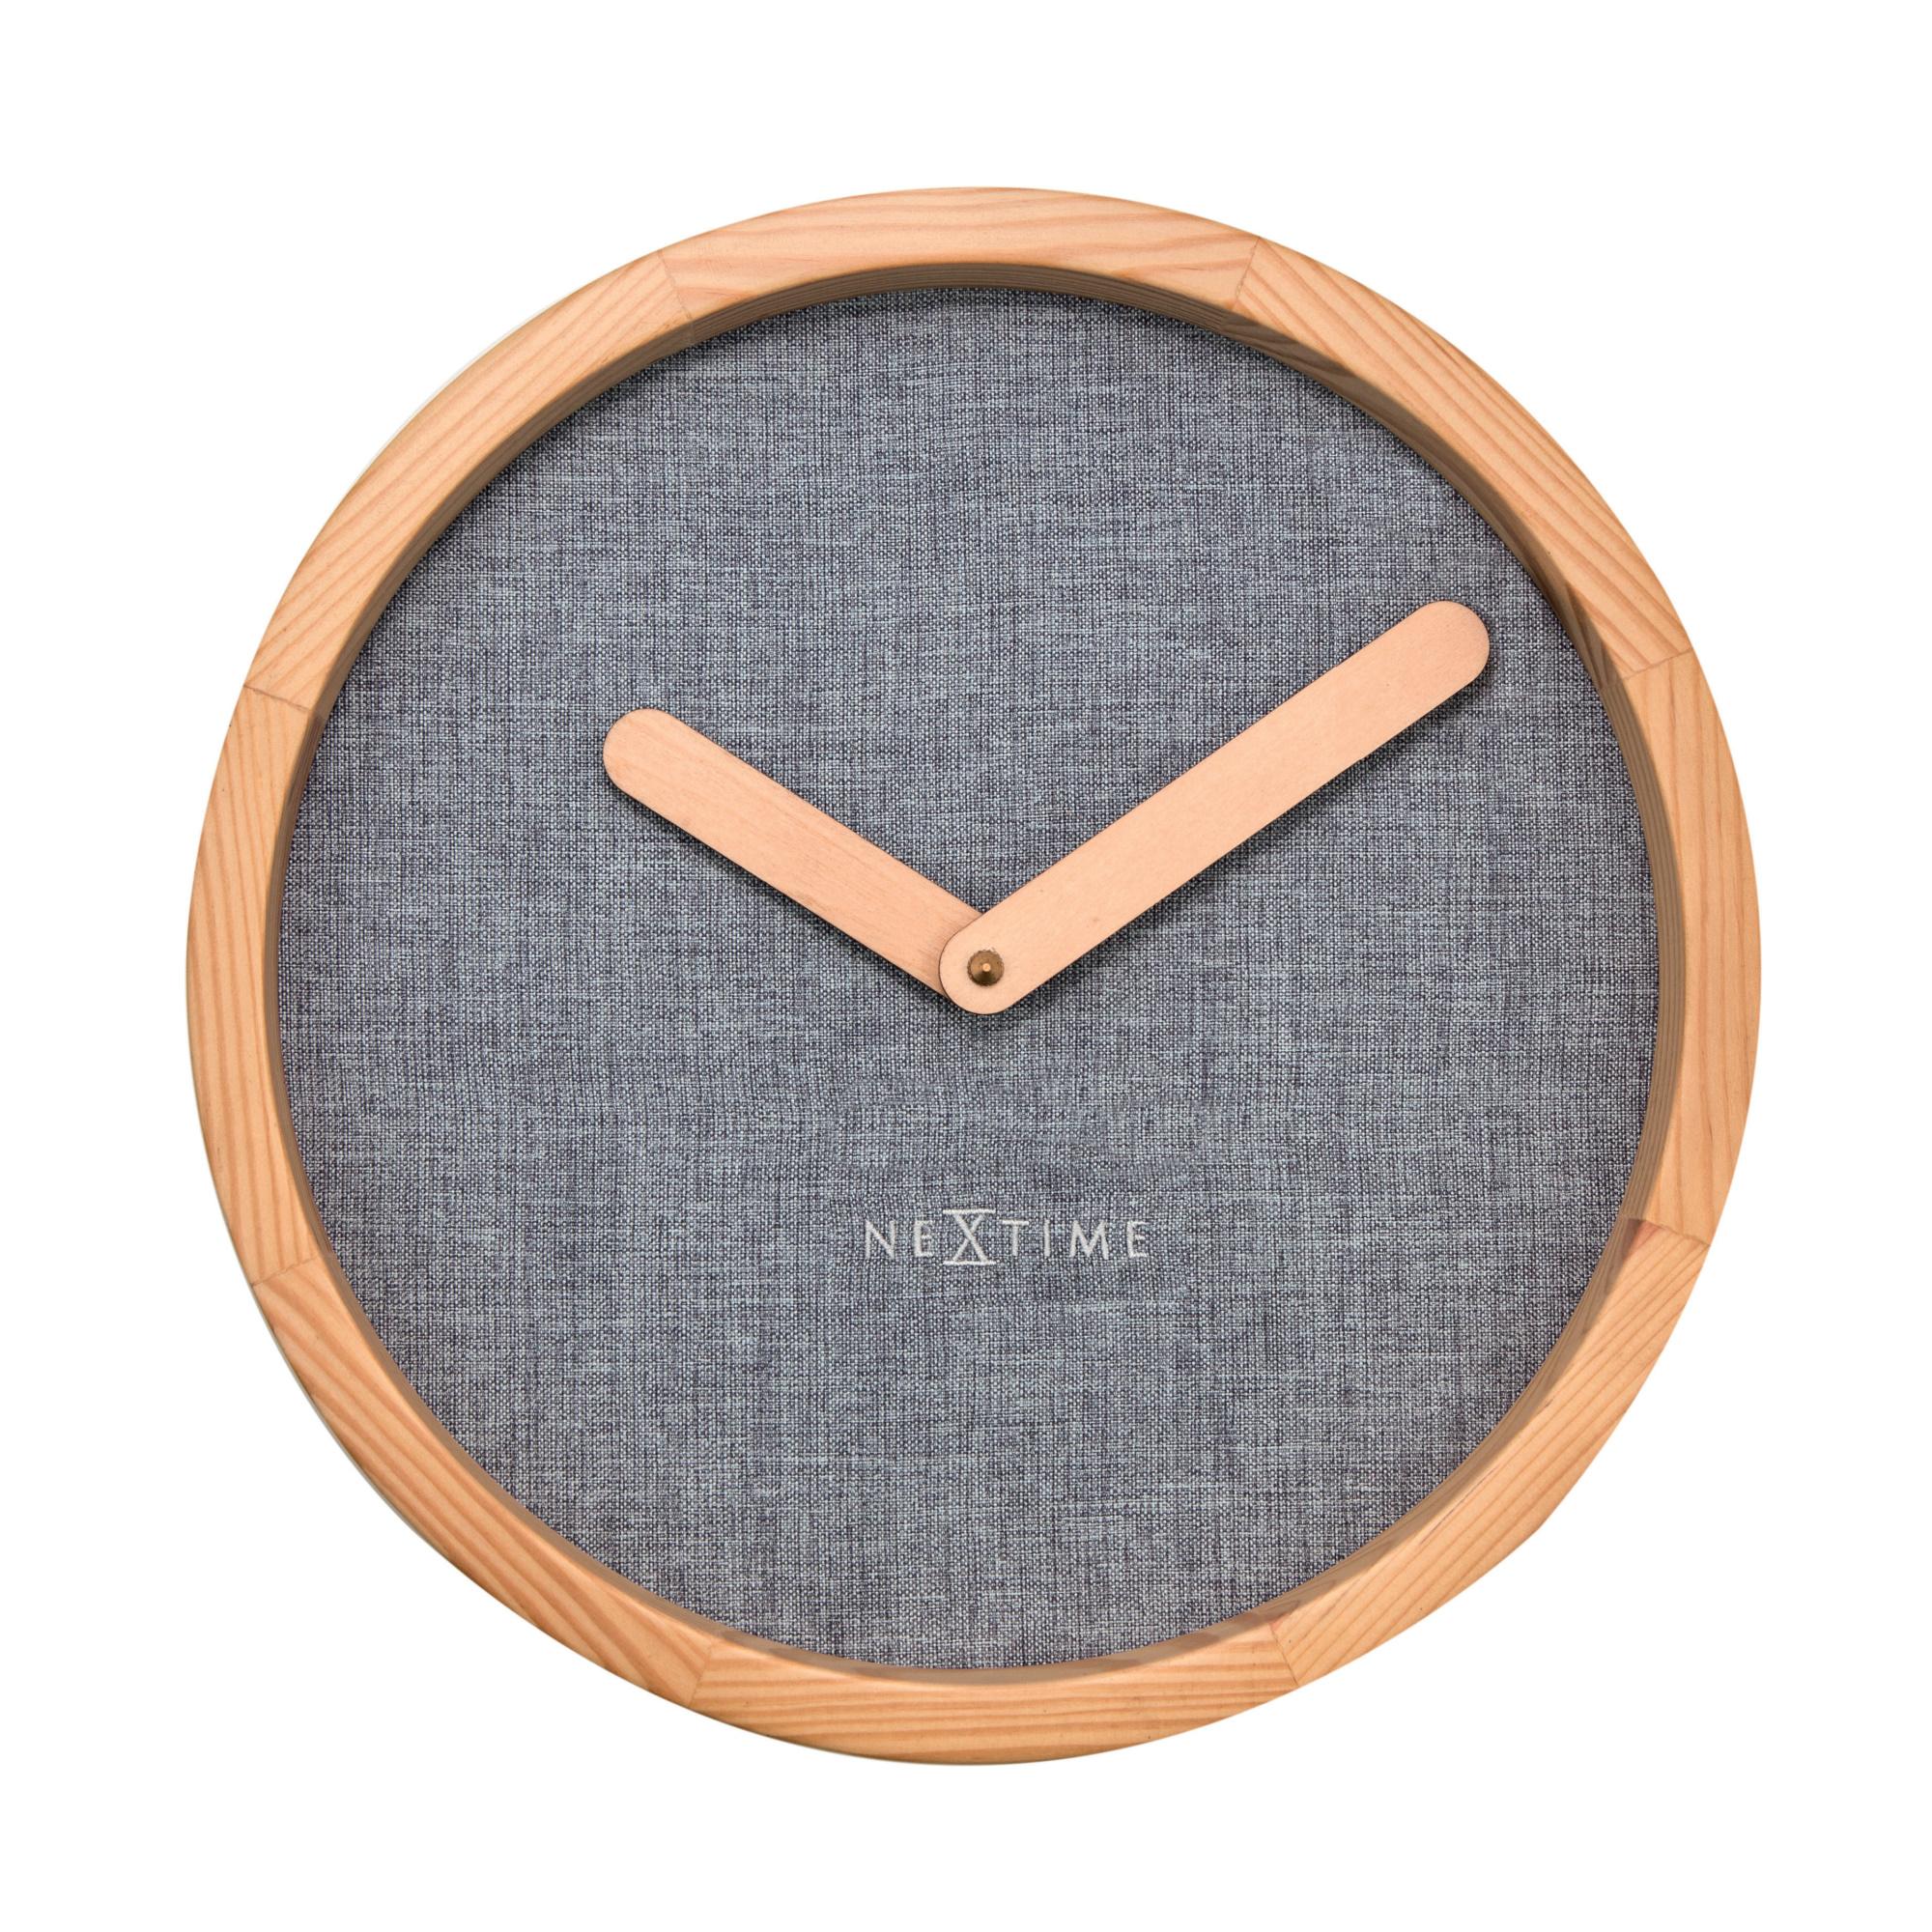 NeXtime Wanduhr CALM Ø30cm lautlos Holz Stoff Uhr Quarzuhr Wohnzimmer Grau  | dynamic-24.de